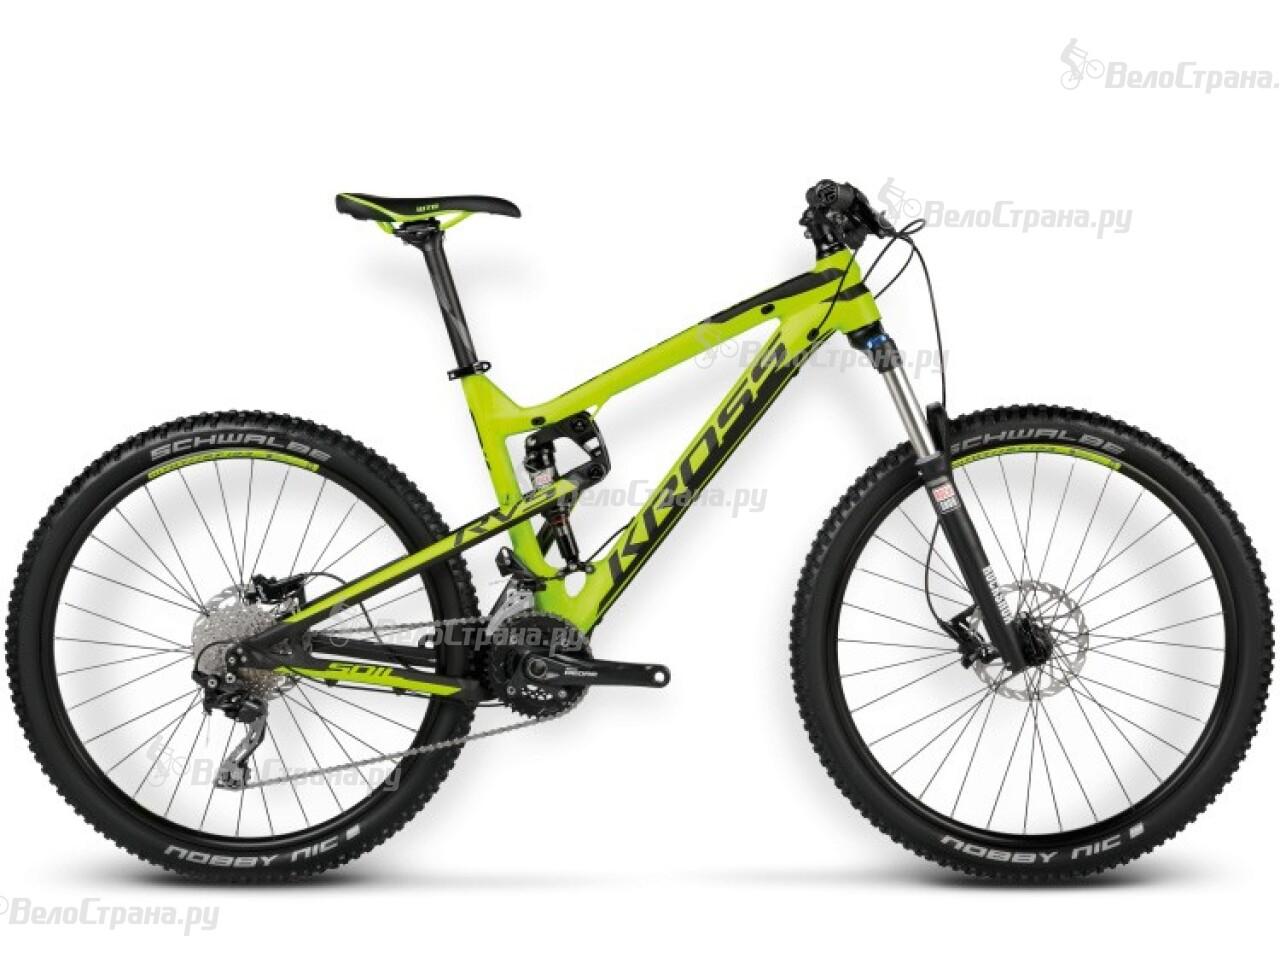 Велосипед Kross Soil 1.0 (2016) велосипед kross inzai 2016